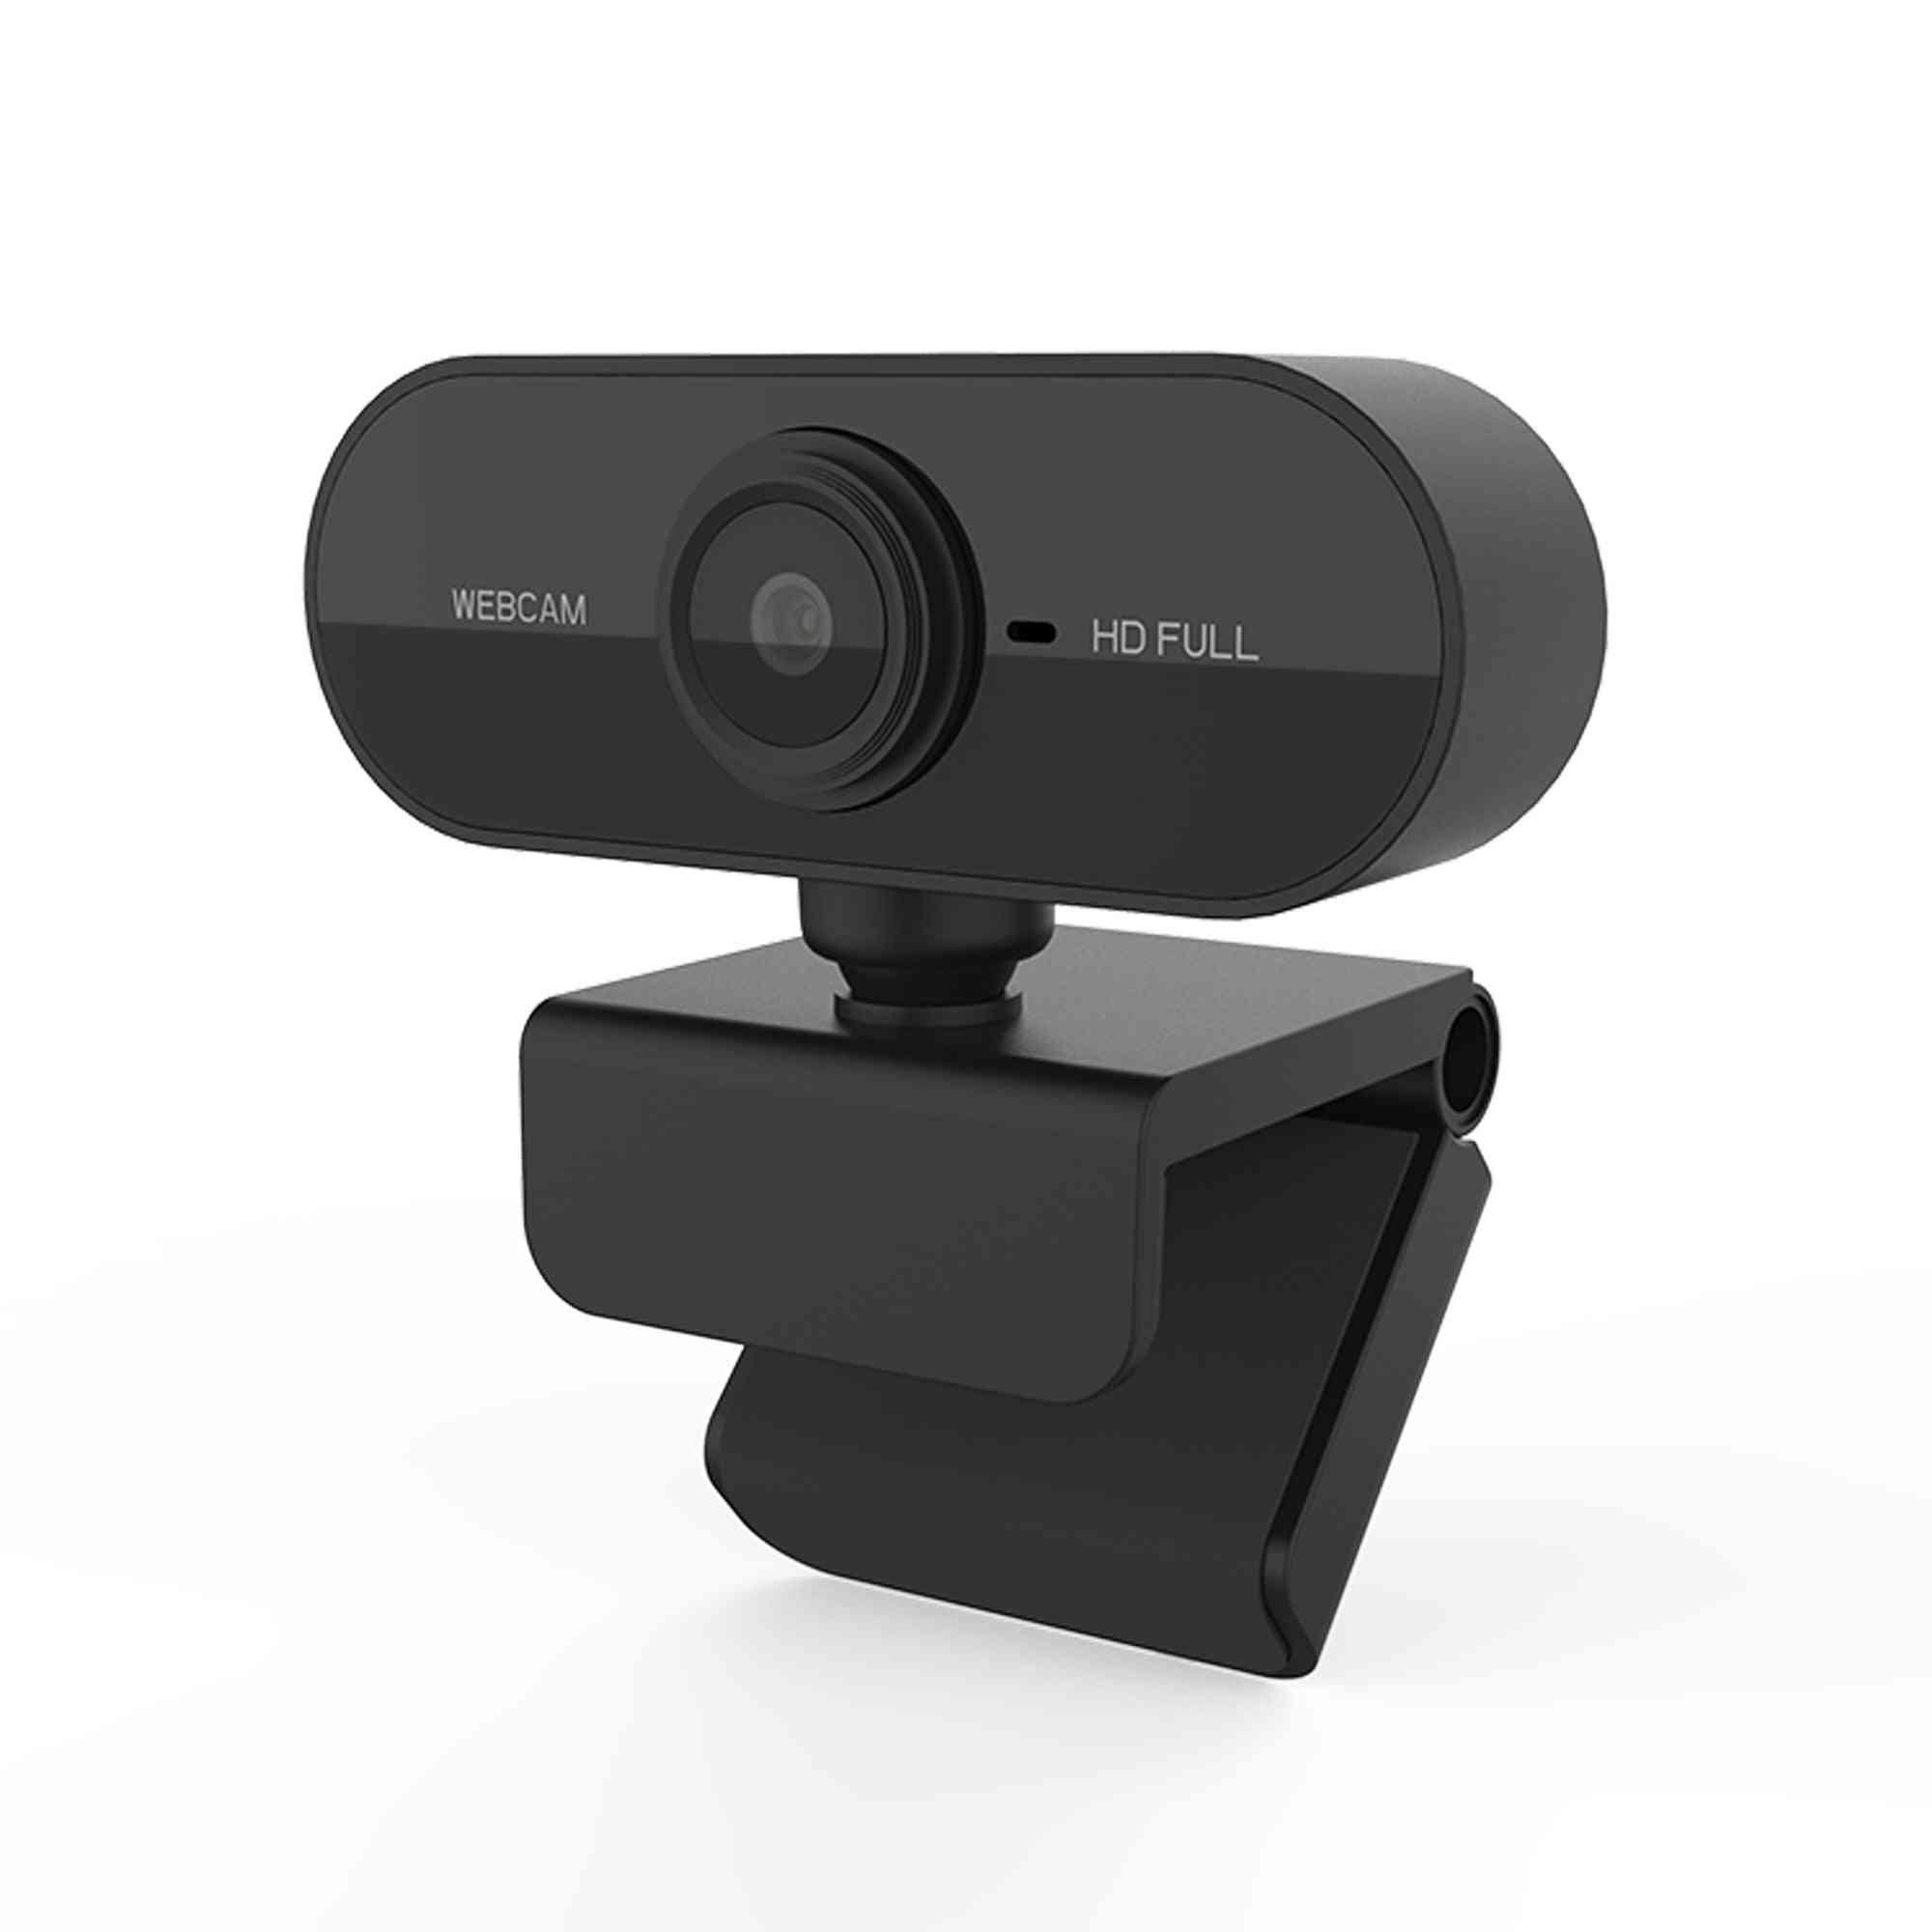 Full Hd 1080p Web Cam Auto Focus Mini Web Camera With Microphone